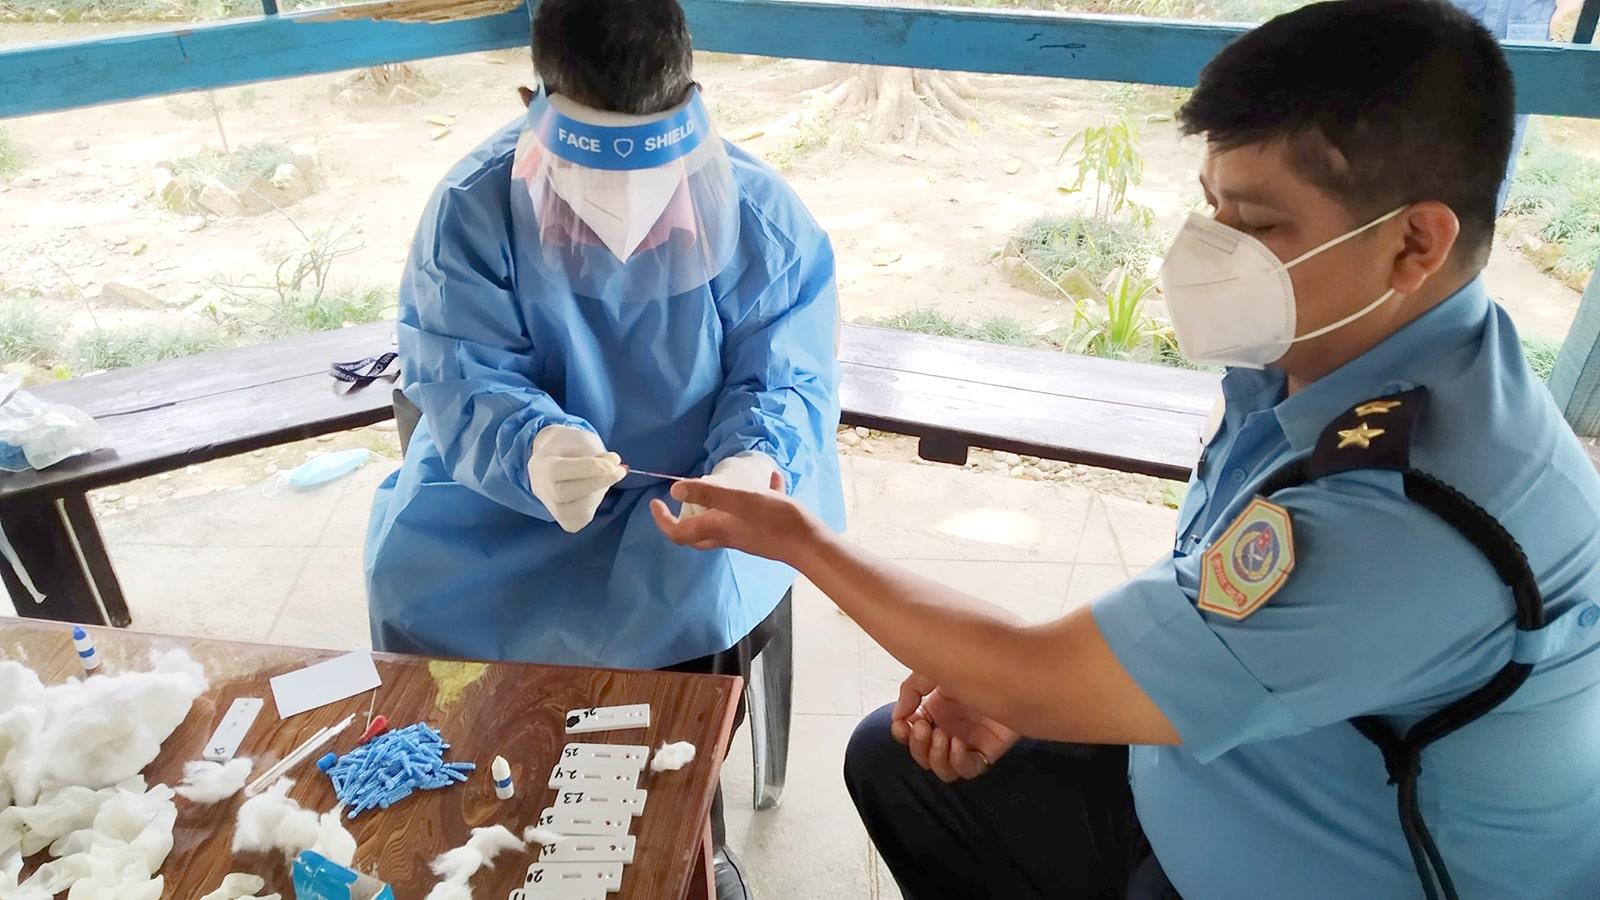 rdt test nuwakot police coronavirus covid19